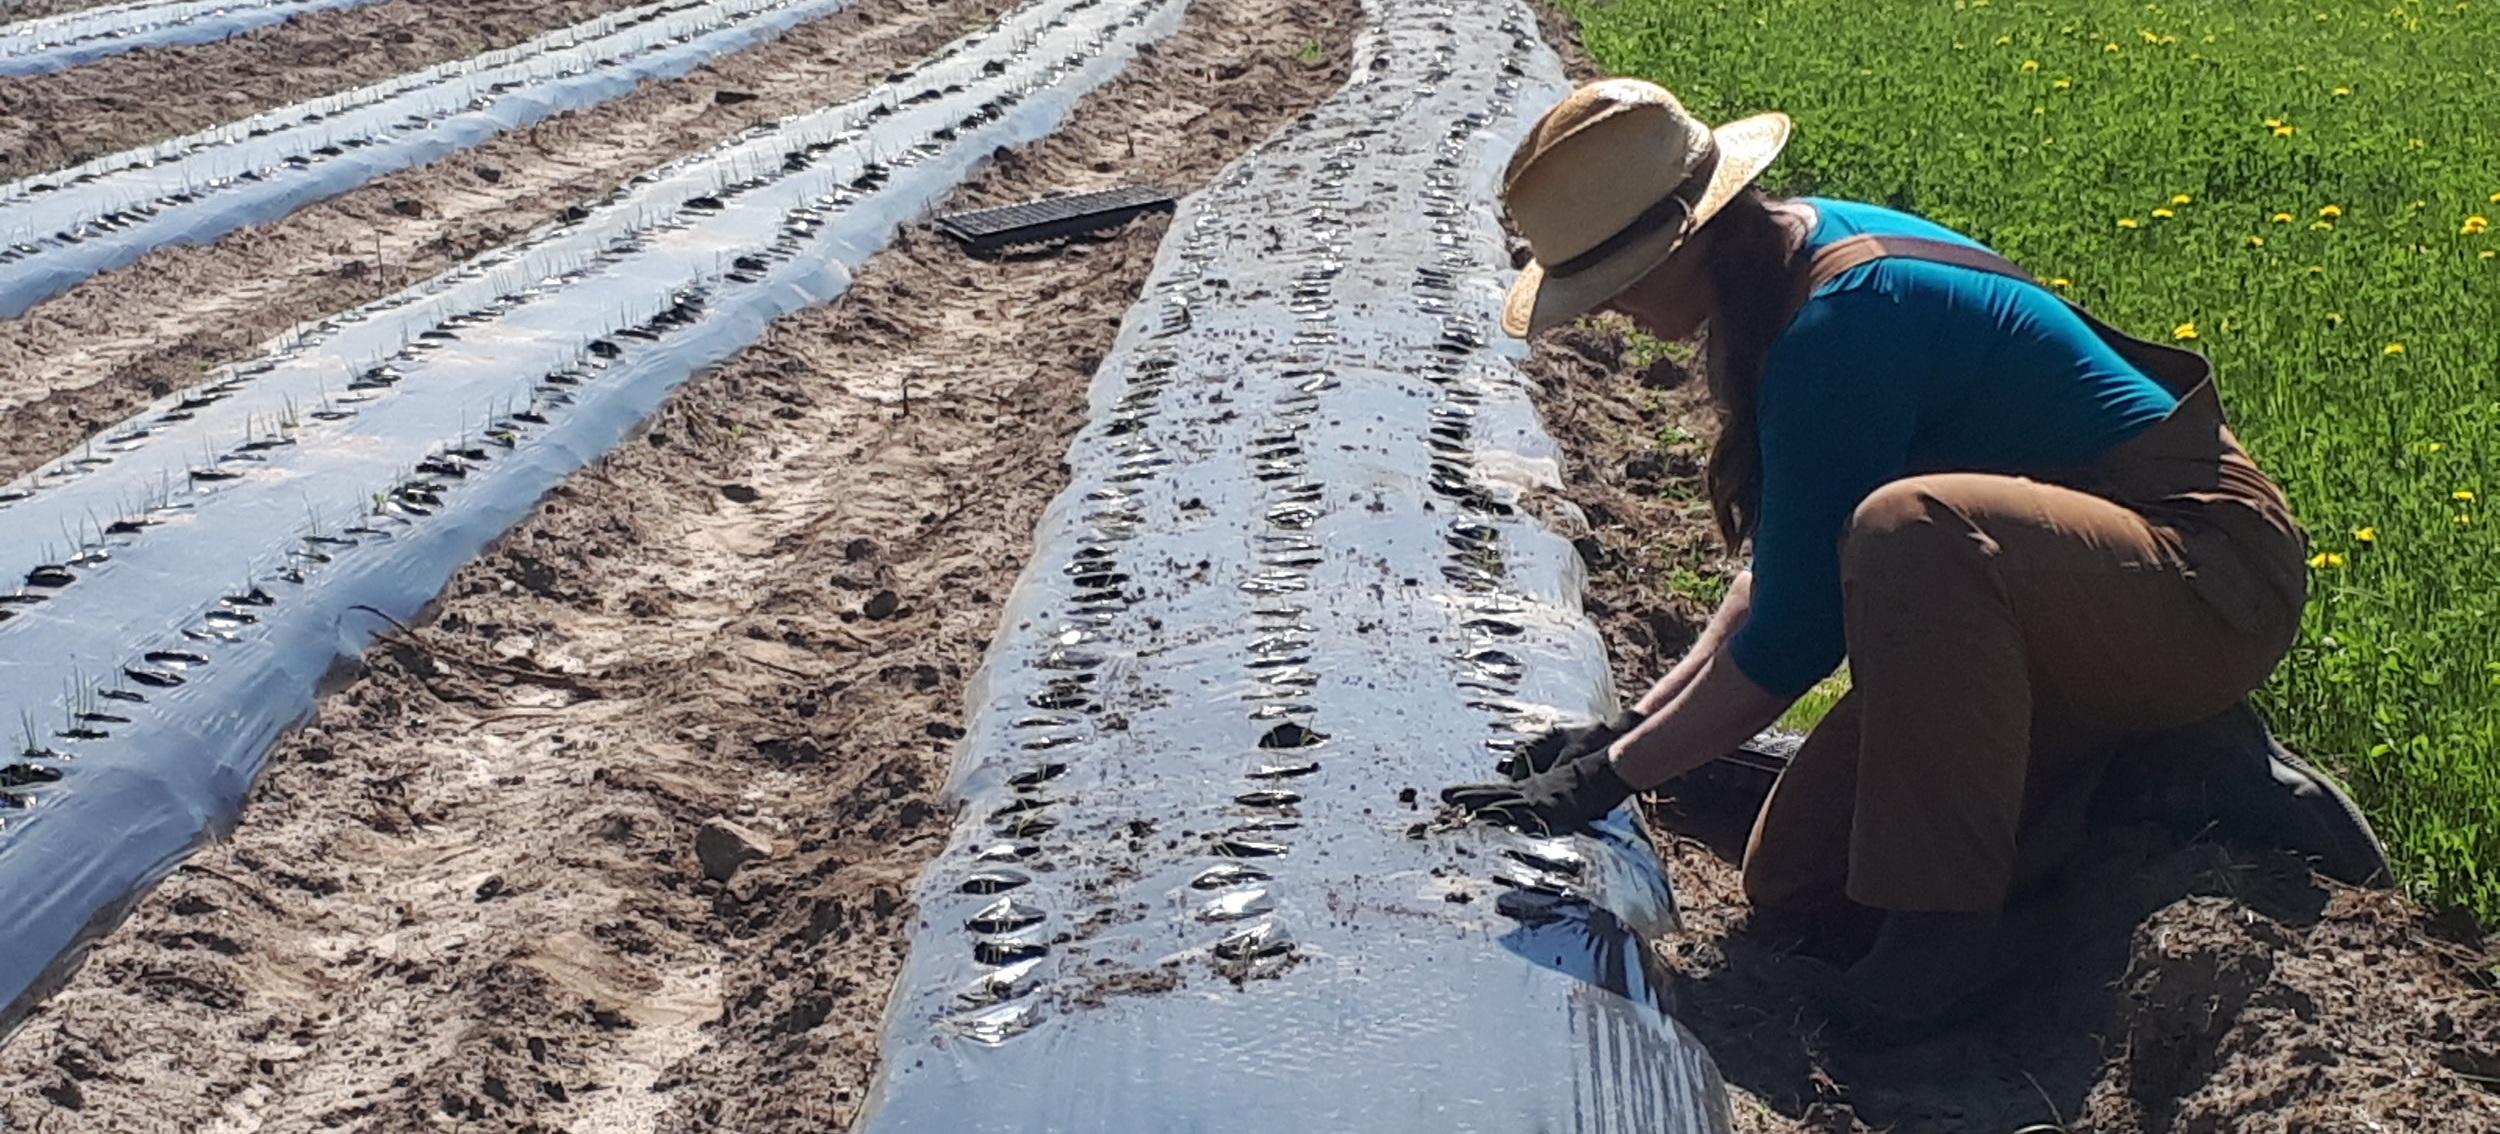 Transplanting onions into plastic mulch.